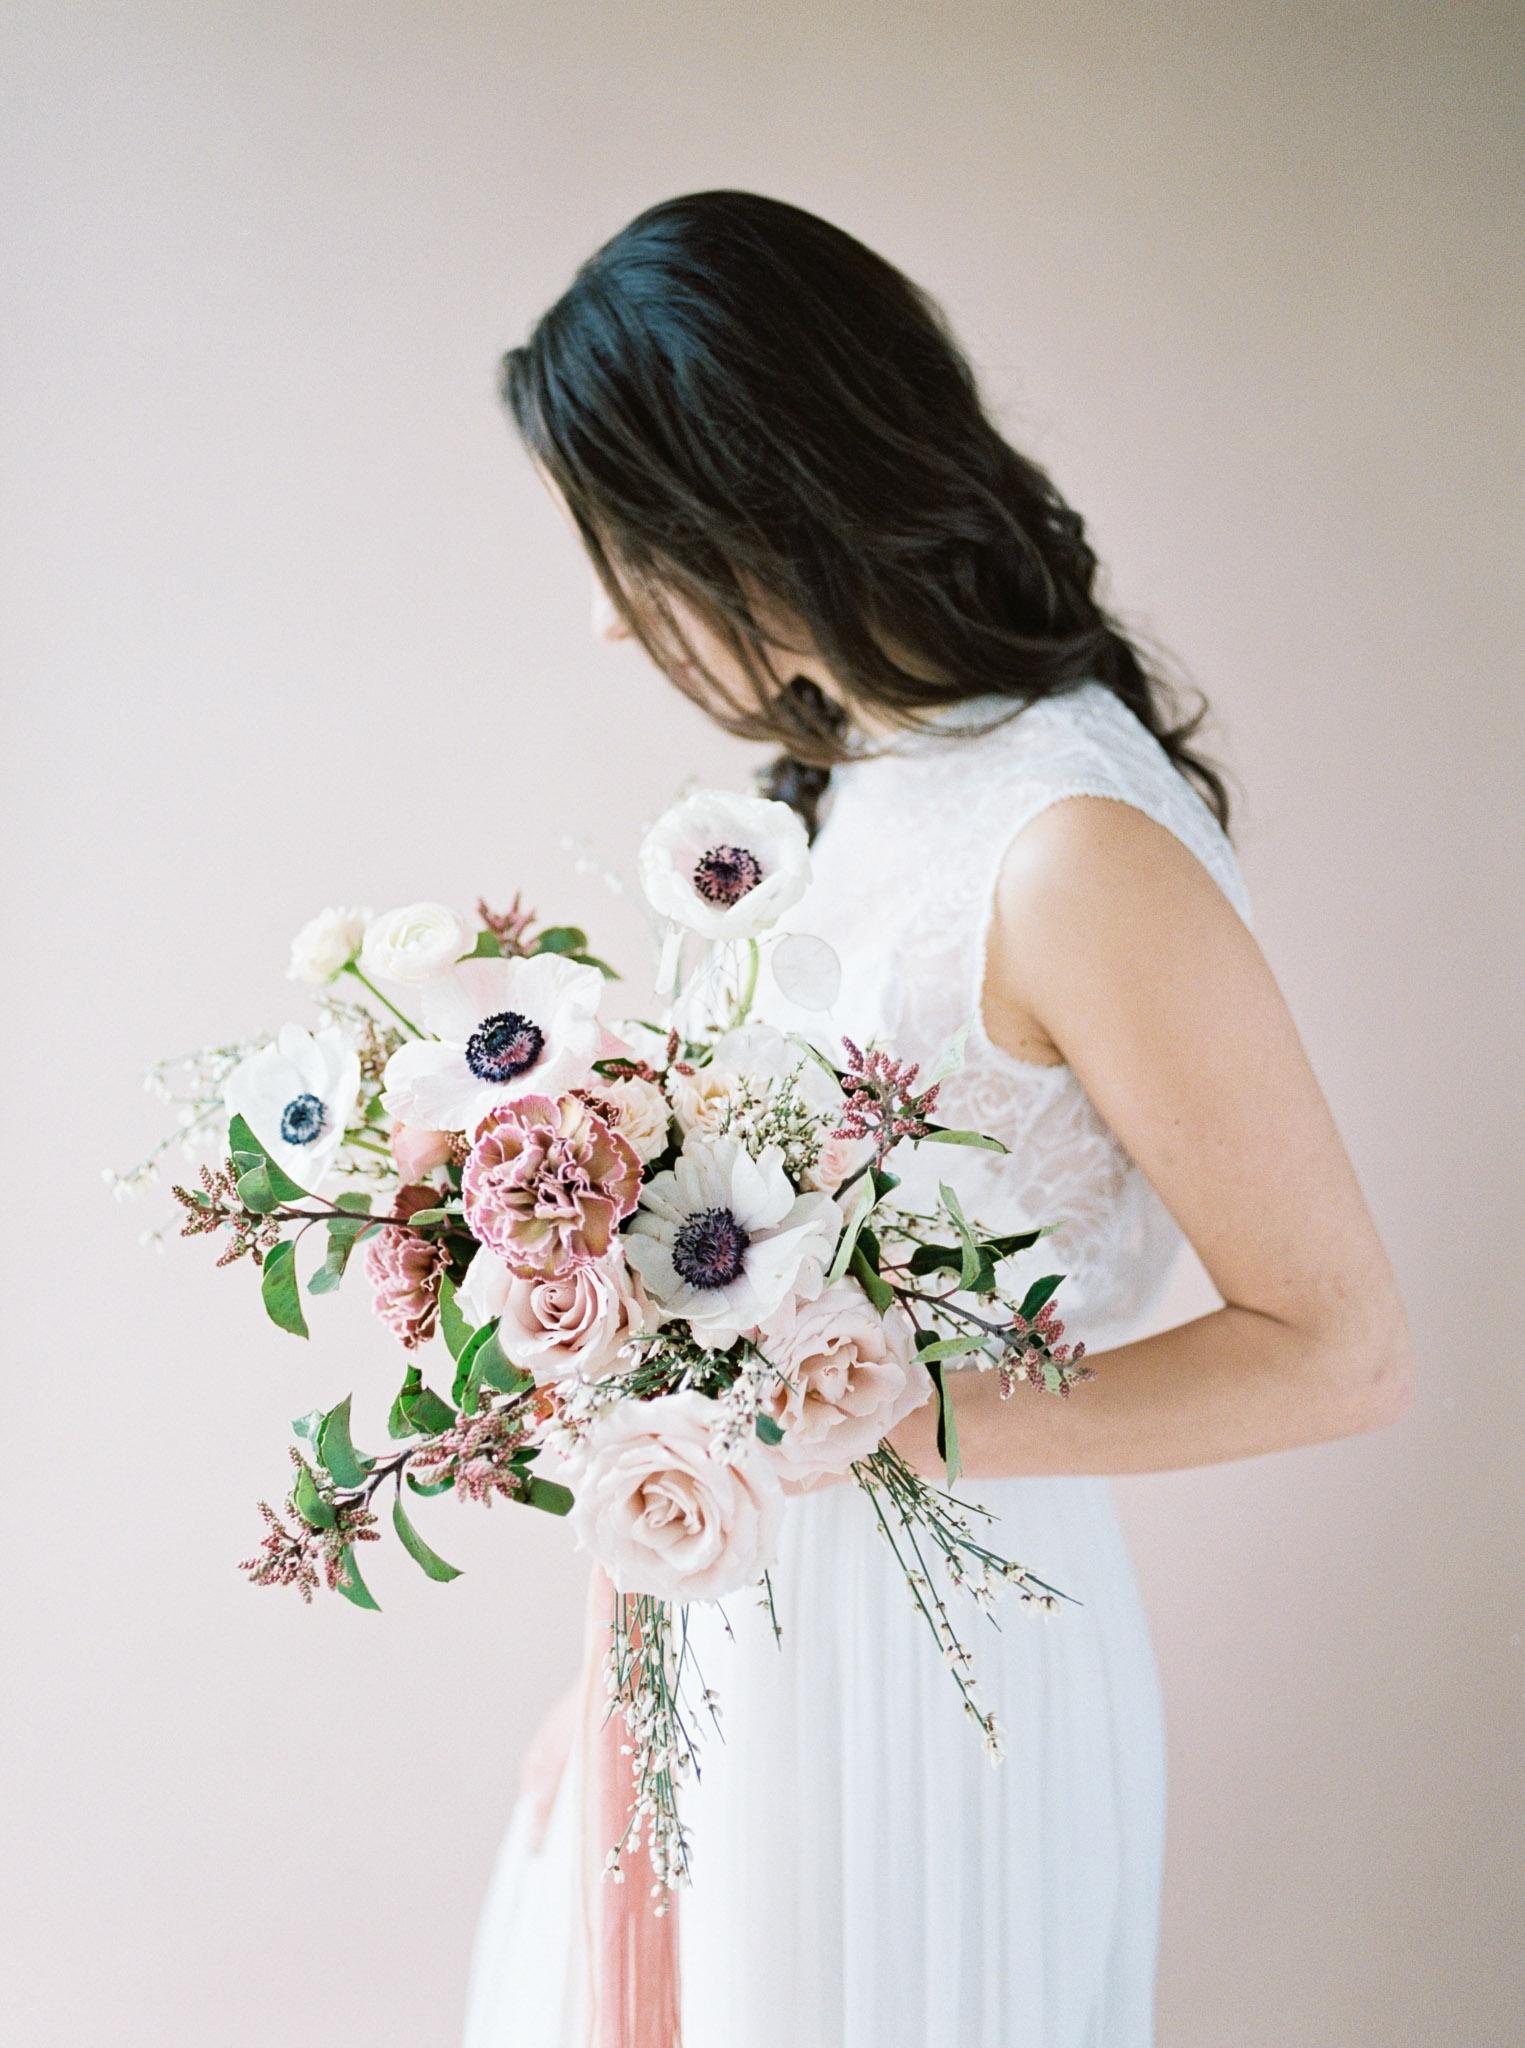 ModernNaturalStyledShoot_MaricleKang_Vancouver Wedding Photographer__01.jpg